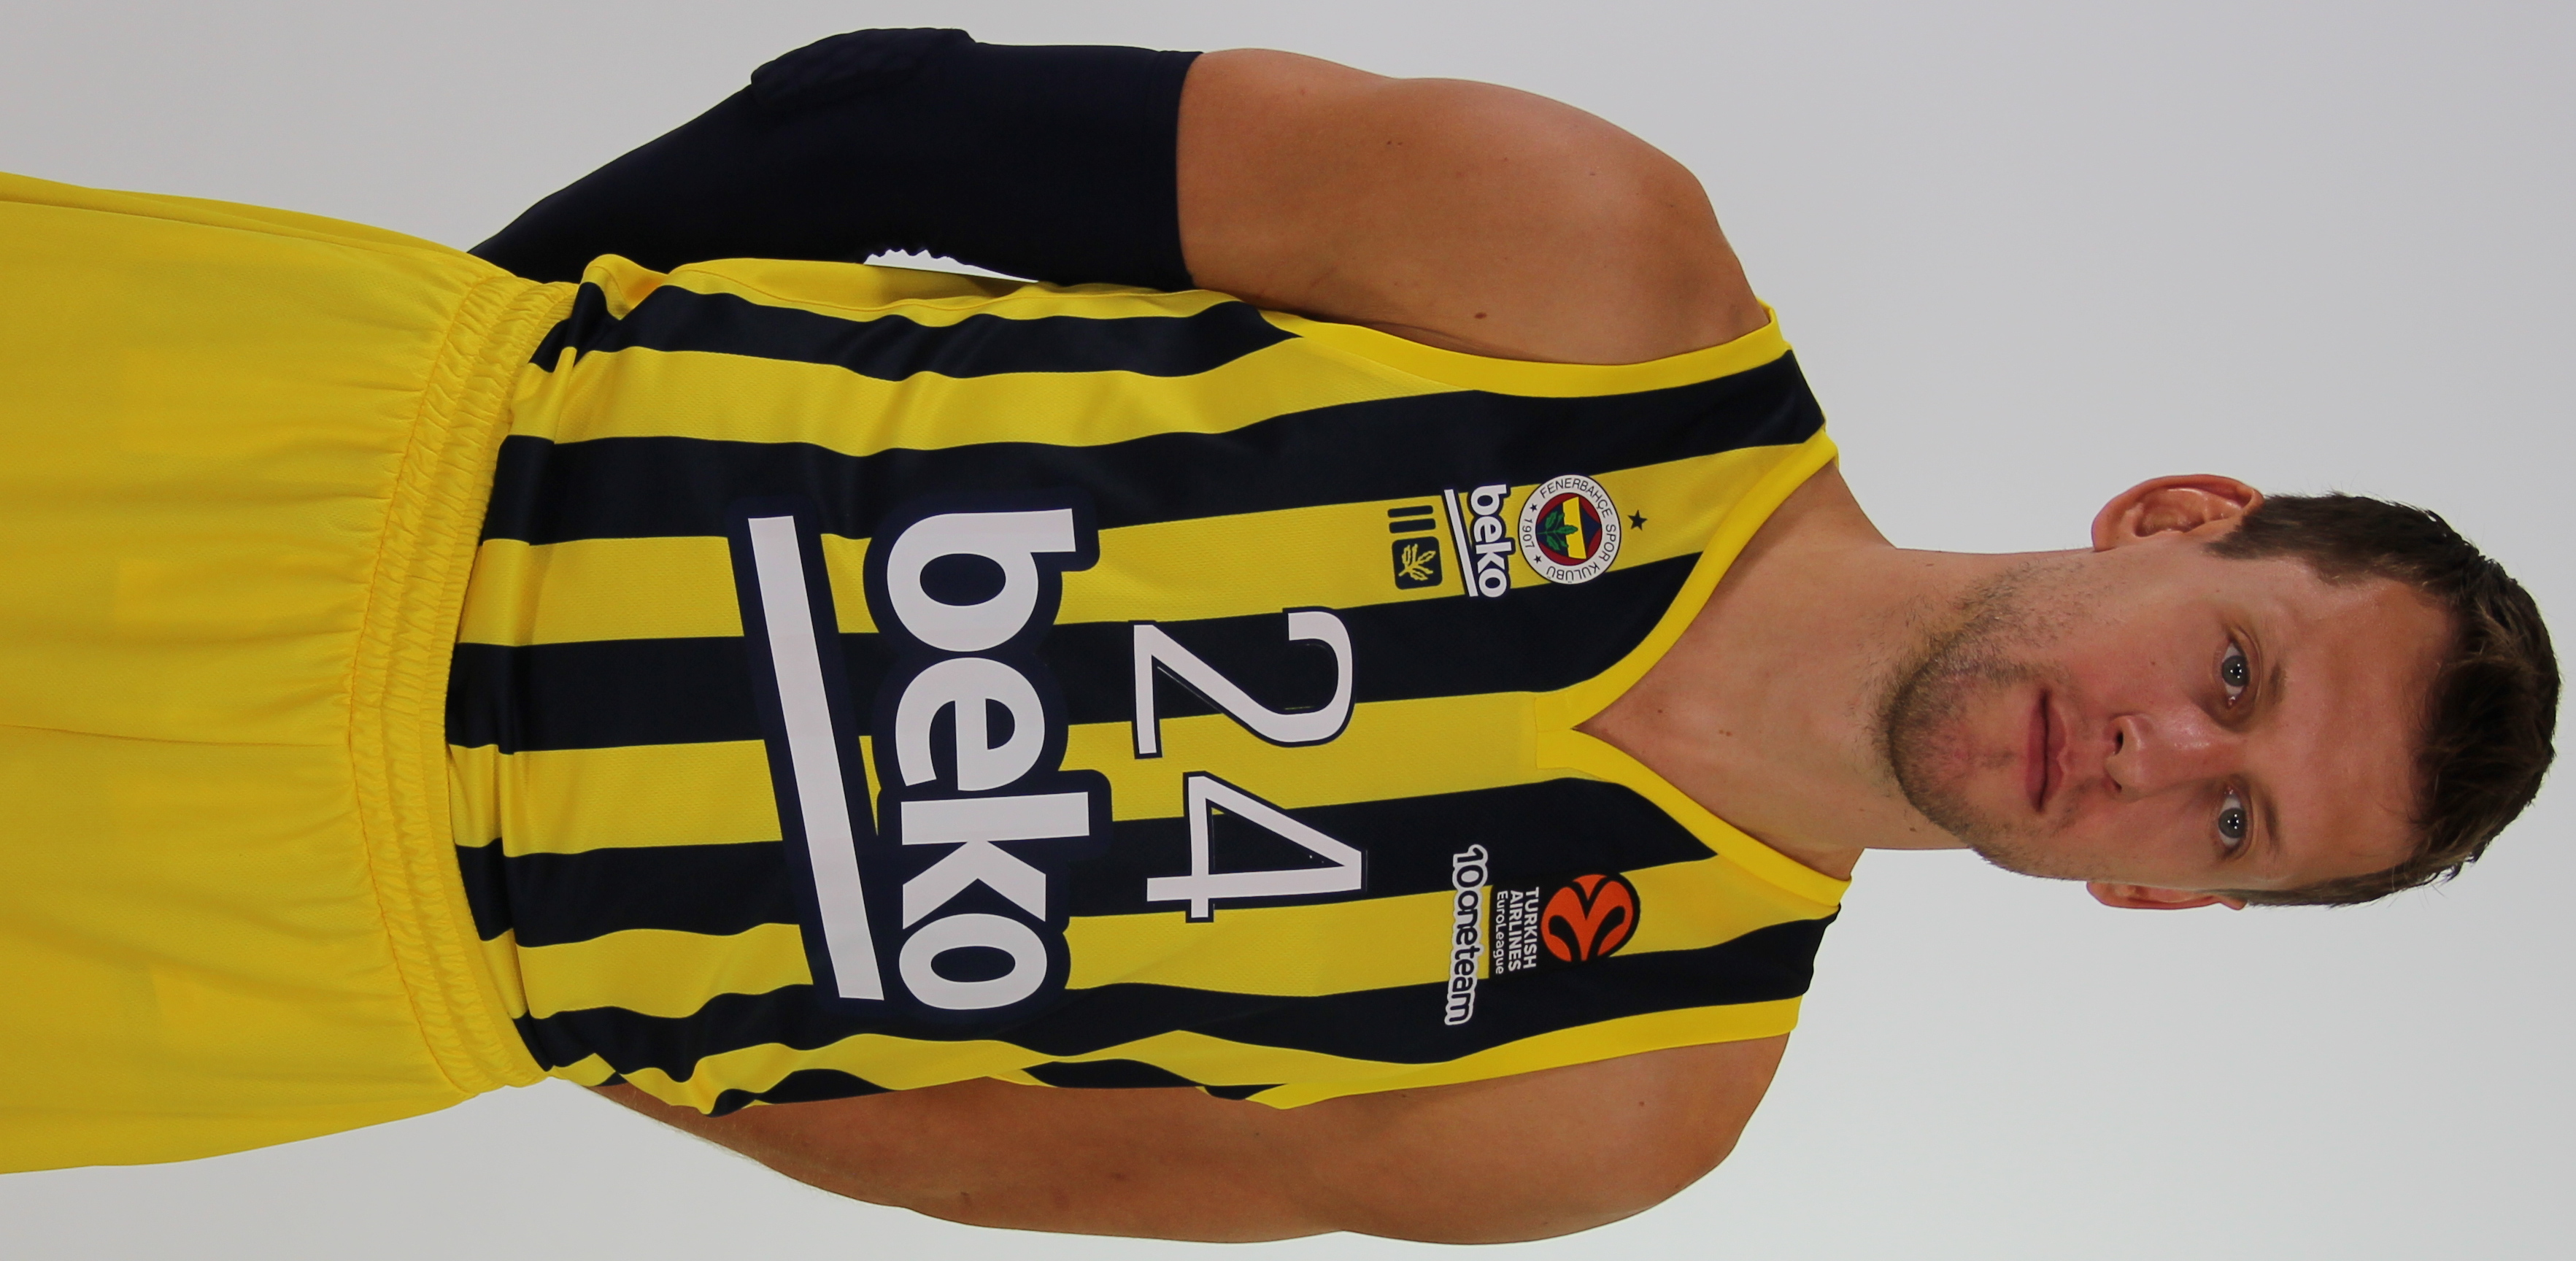 Veselý with [[Fenerbahçe Men's Basketball|Fenerbahçe]] in 2021